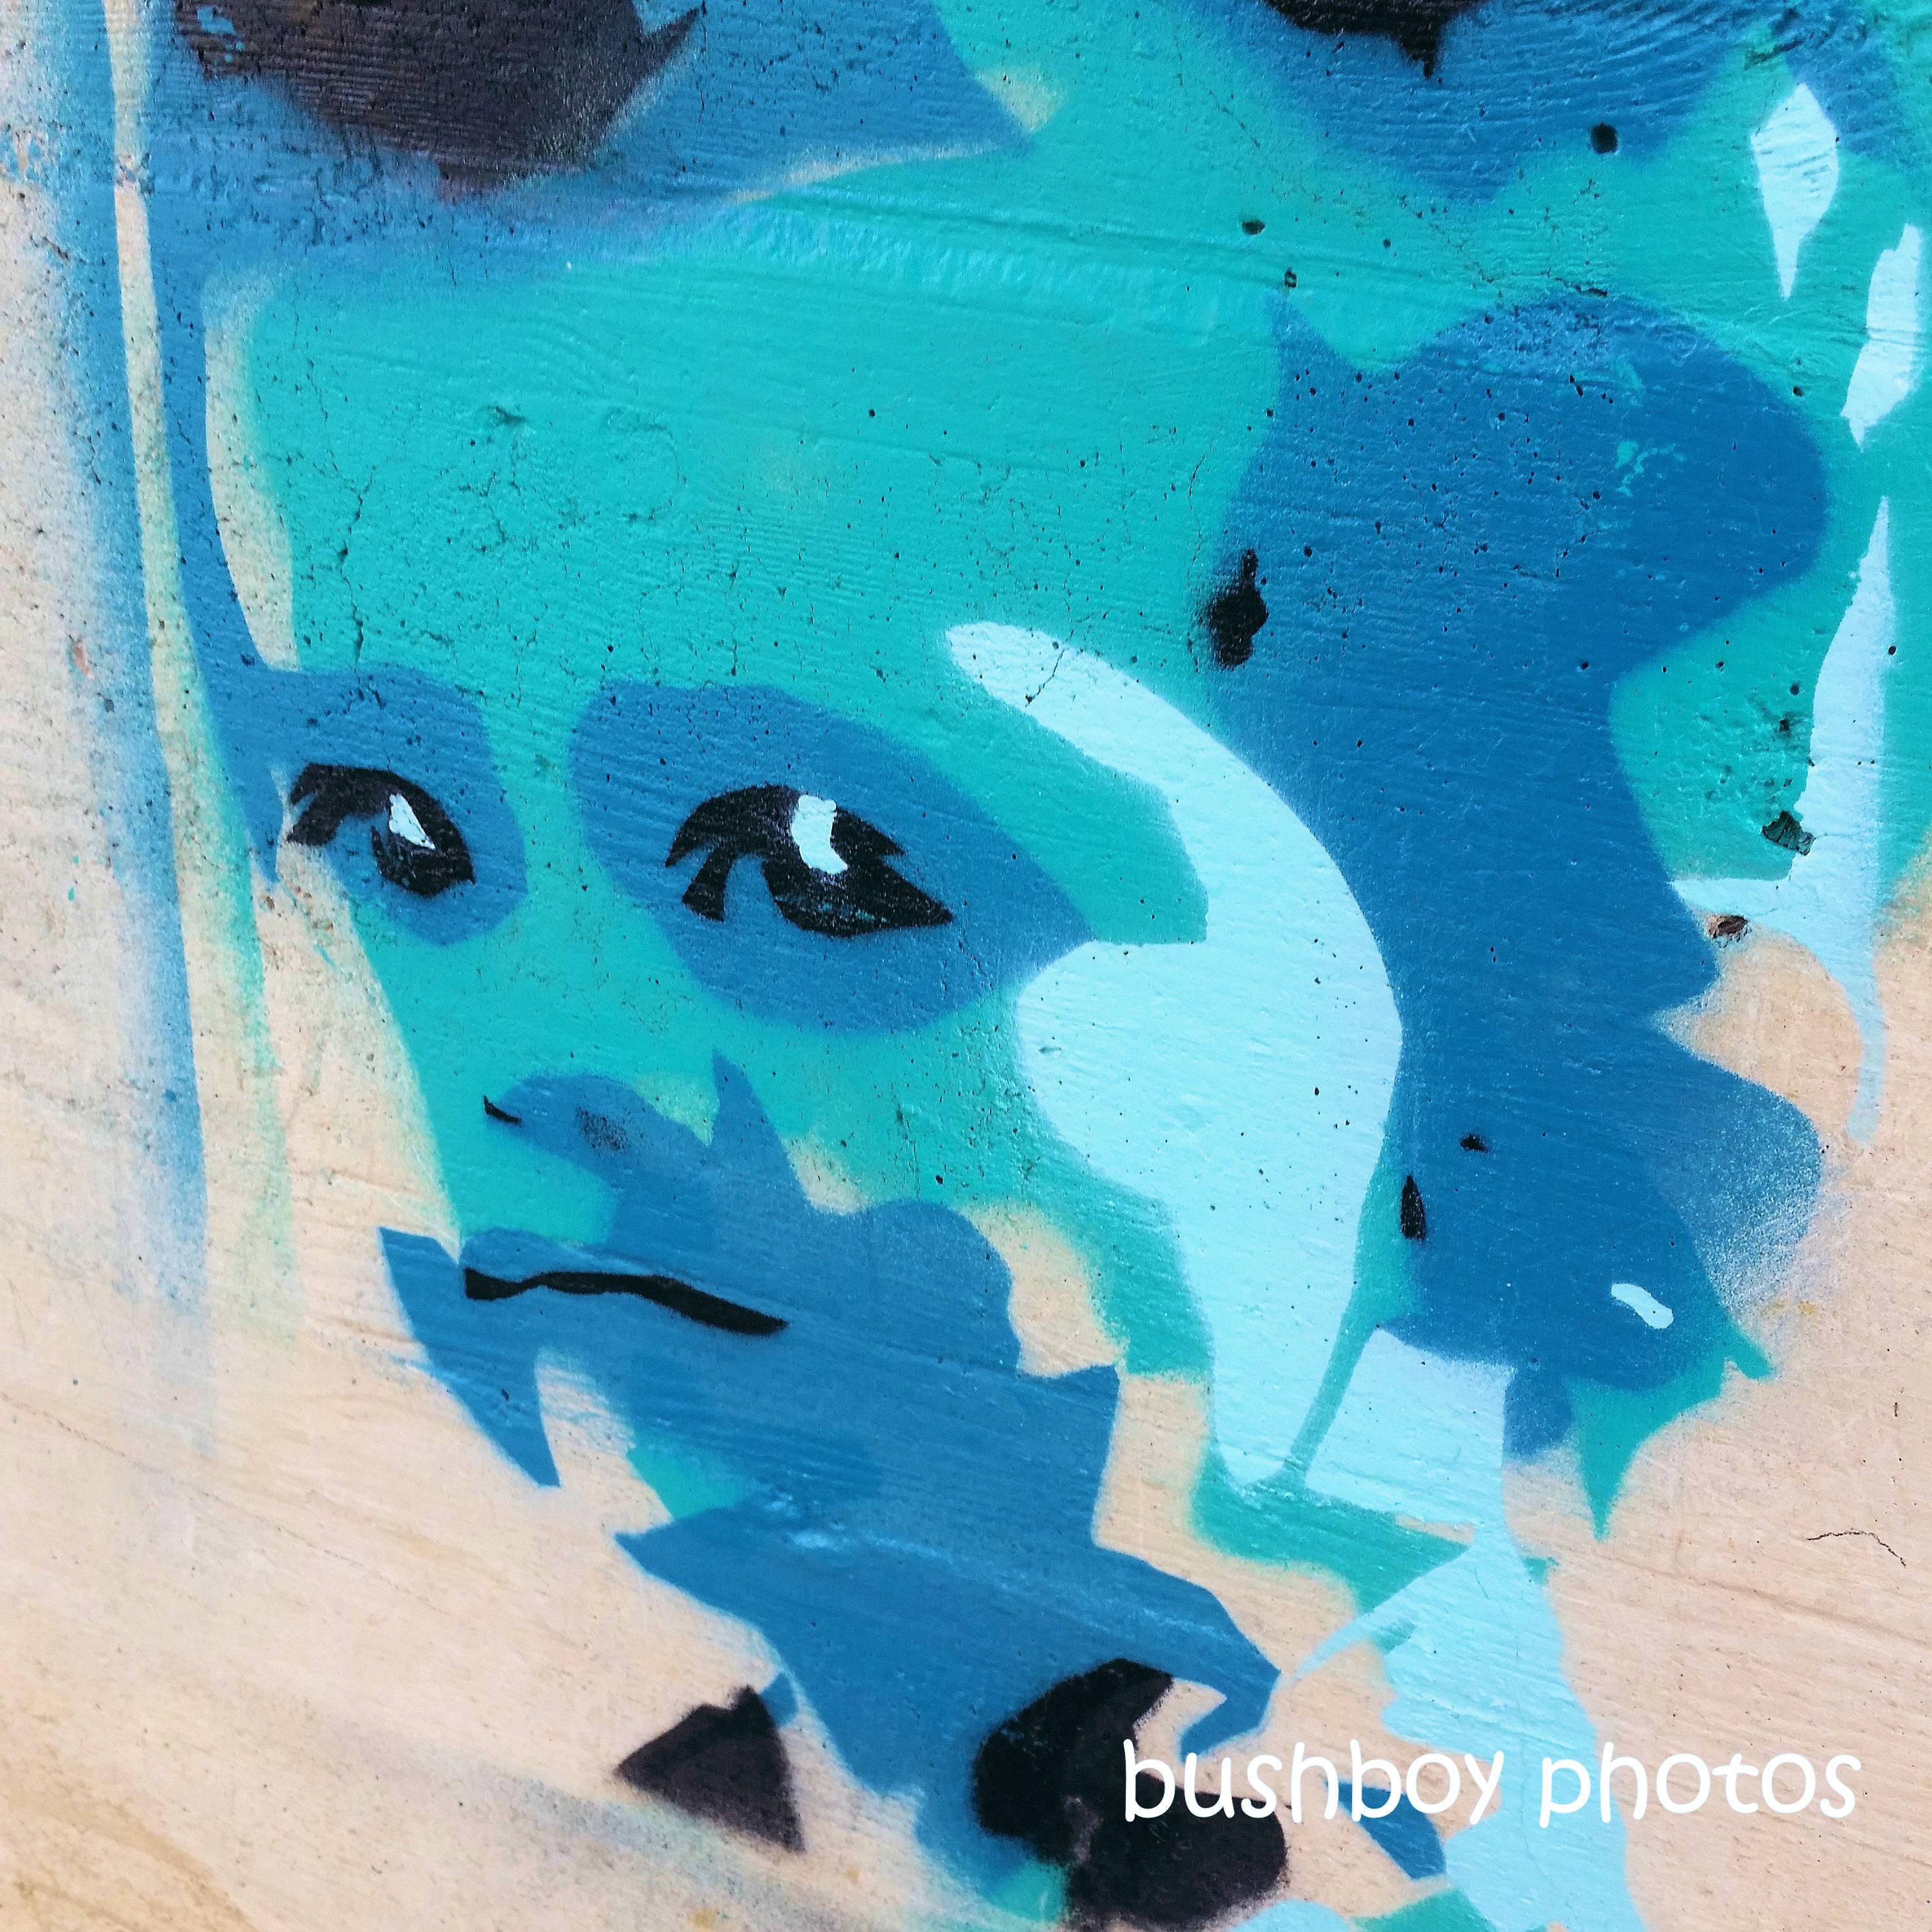 190719_blog_challenge_blue_street_art_face_grafton